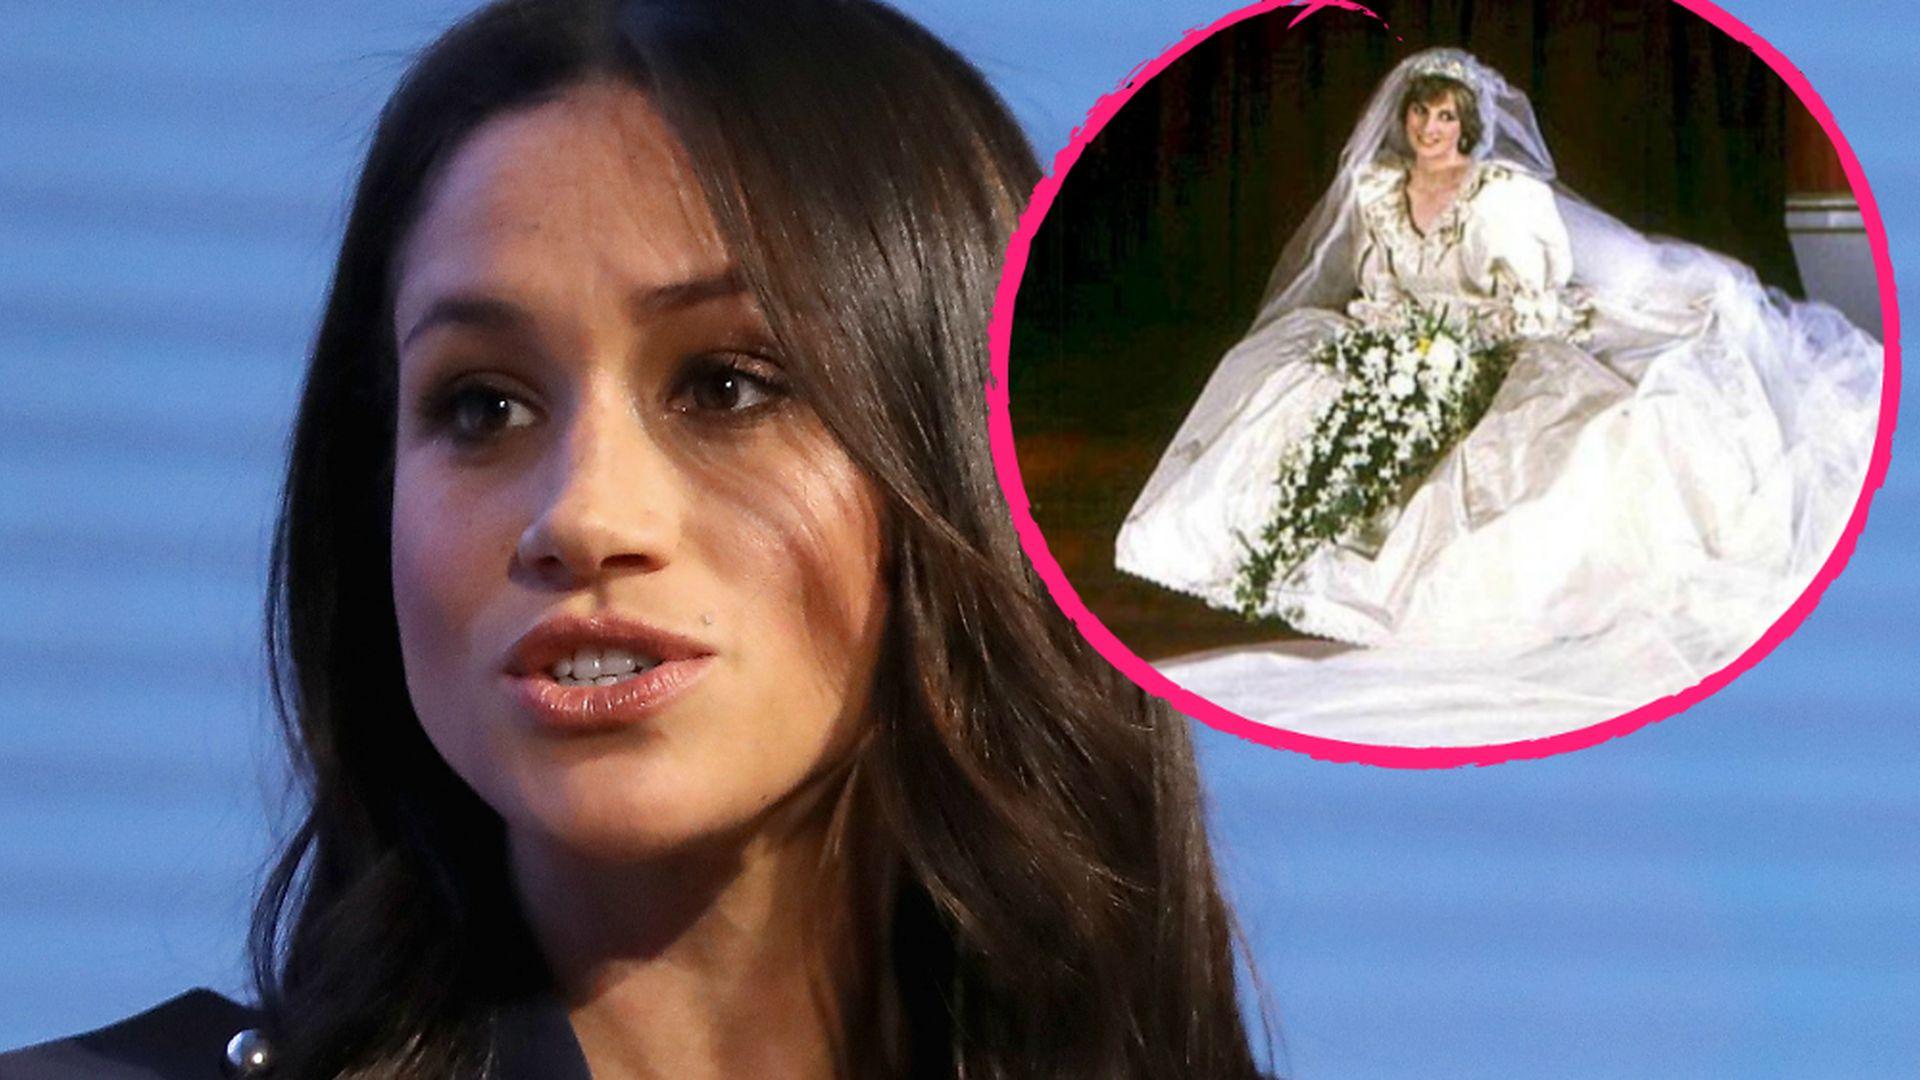 Brautkleid-Horror: Meghan vorsichtiger als Lady Diana? | Promiflash.de